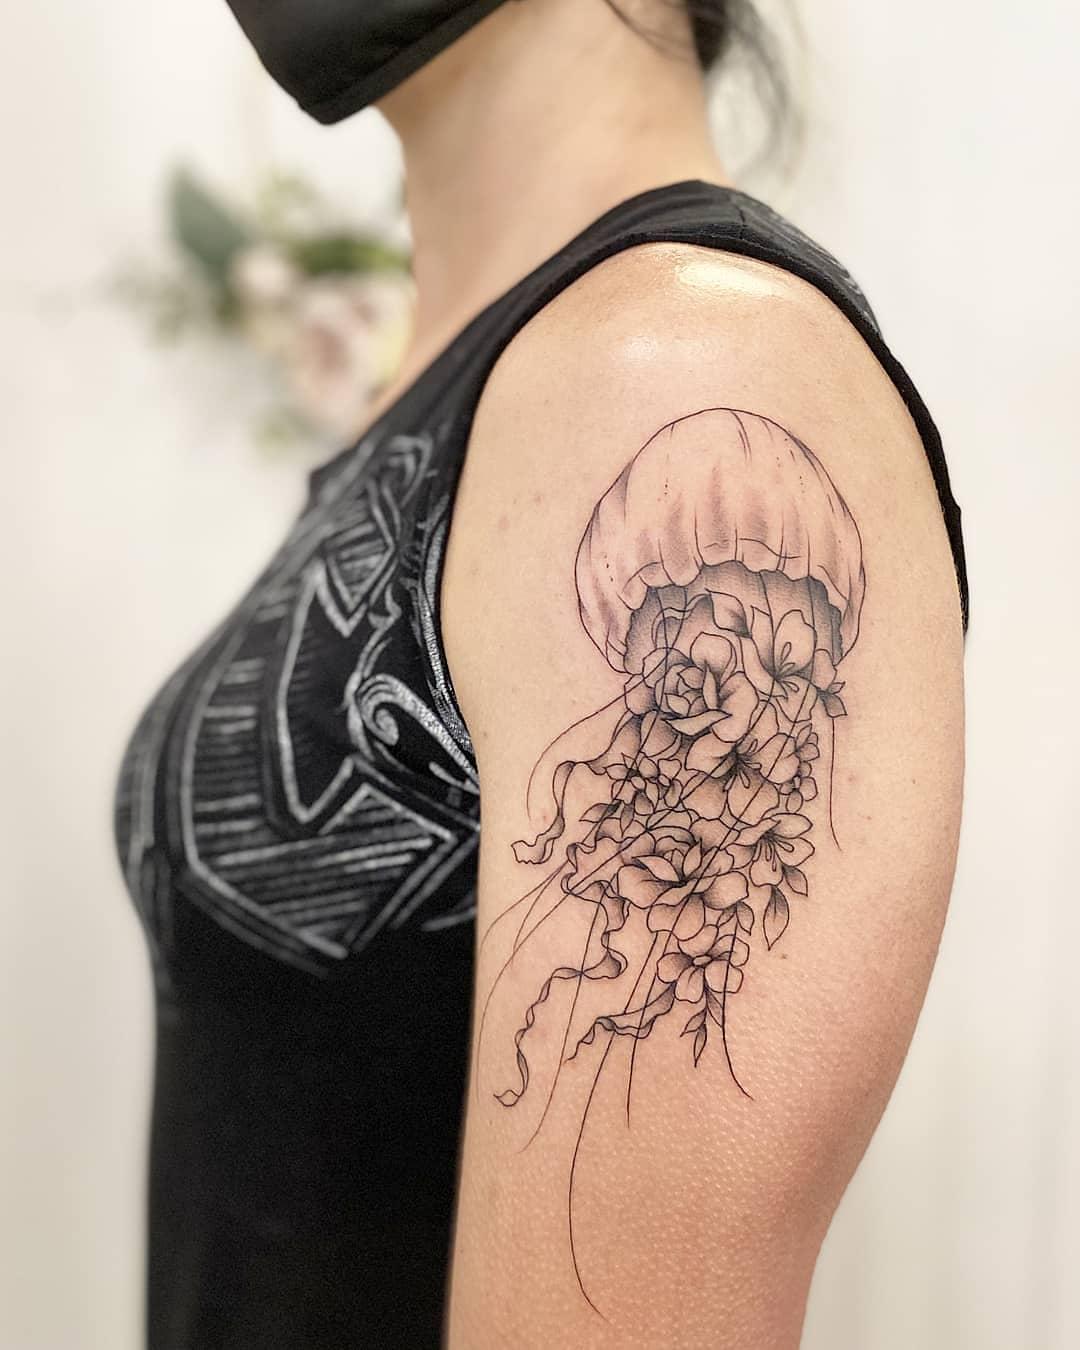 jamie-kan-tattoo-jellyfish